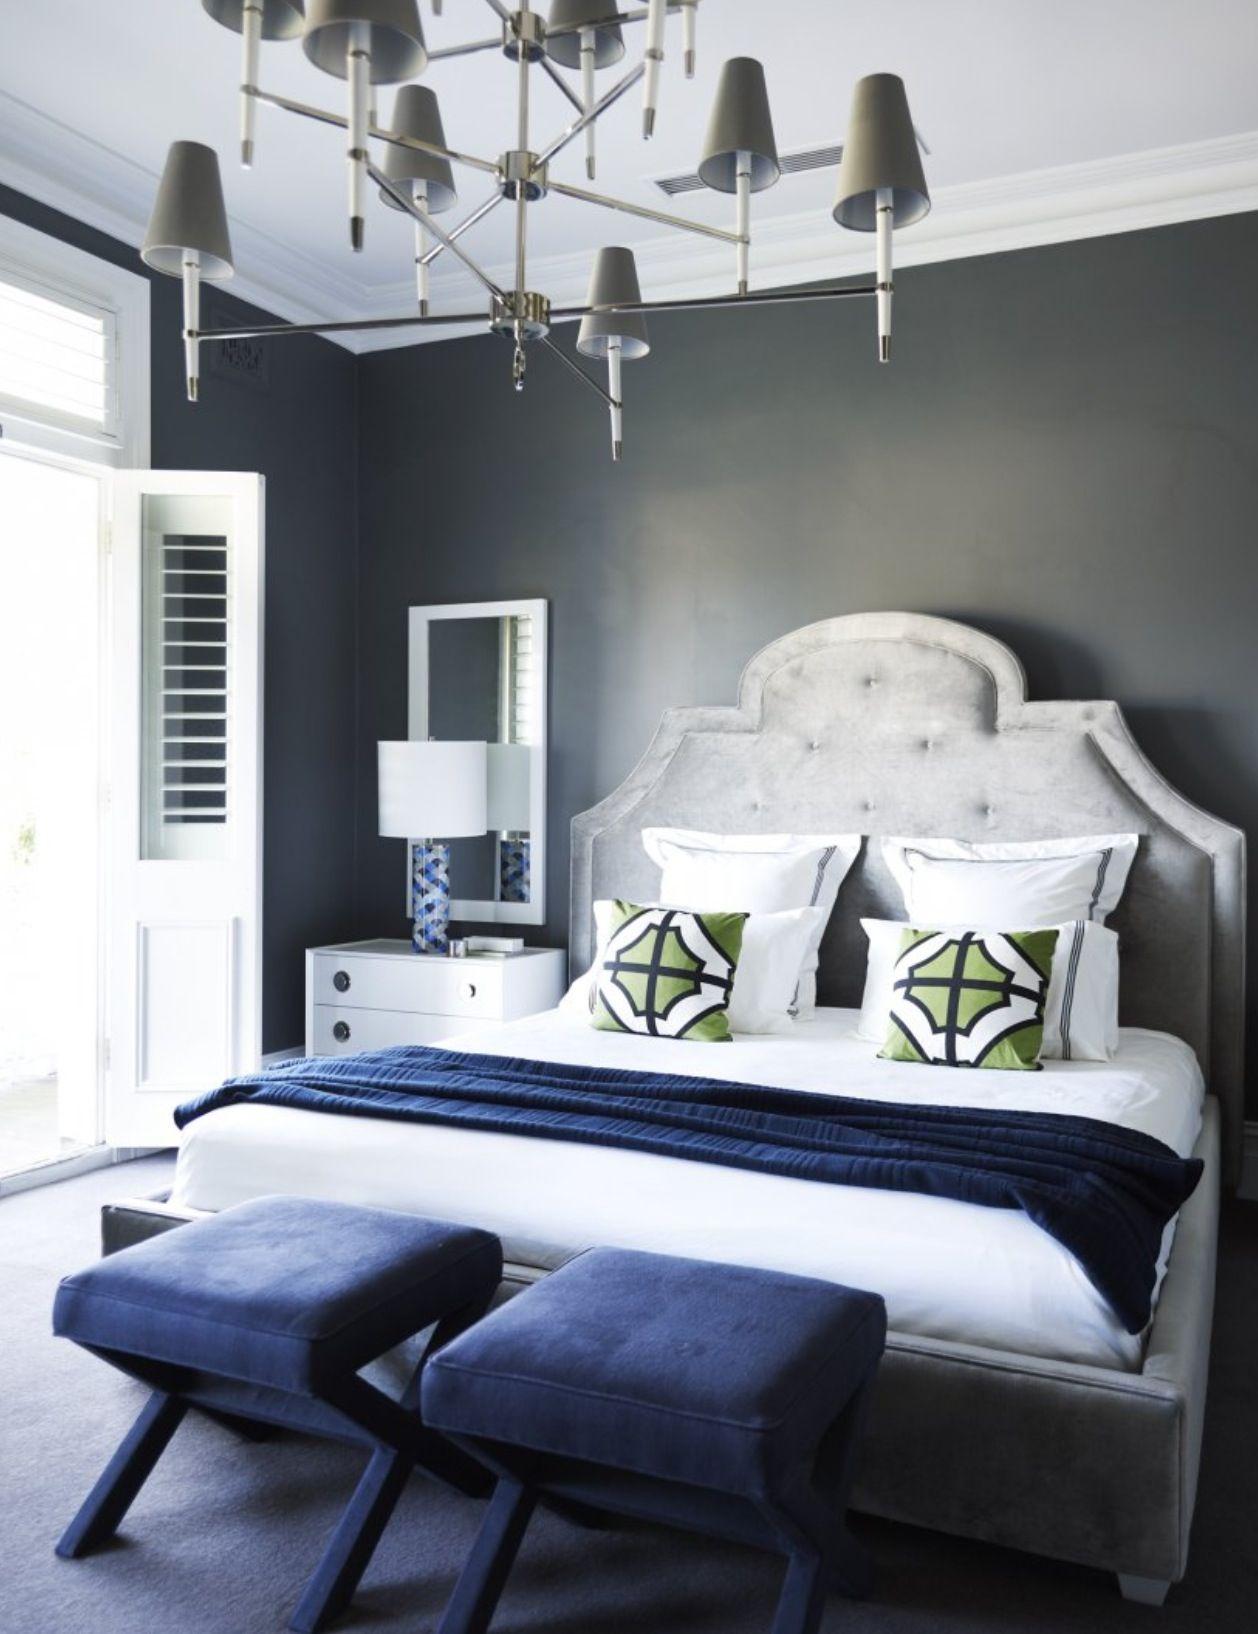 Flip Flop Walls And Headboard Light Grey Paint With Darker